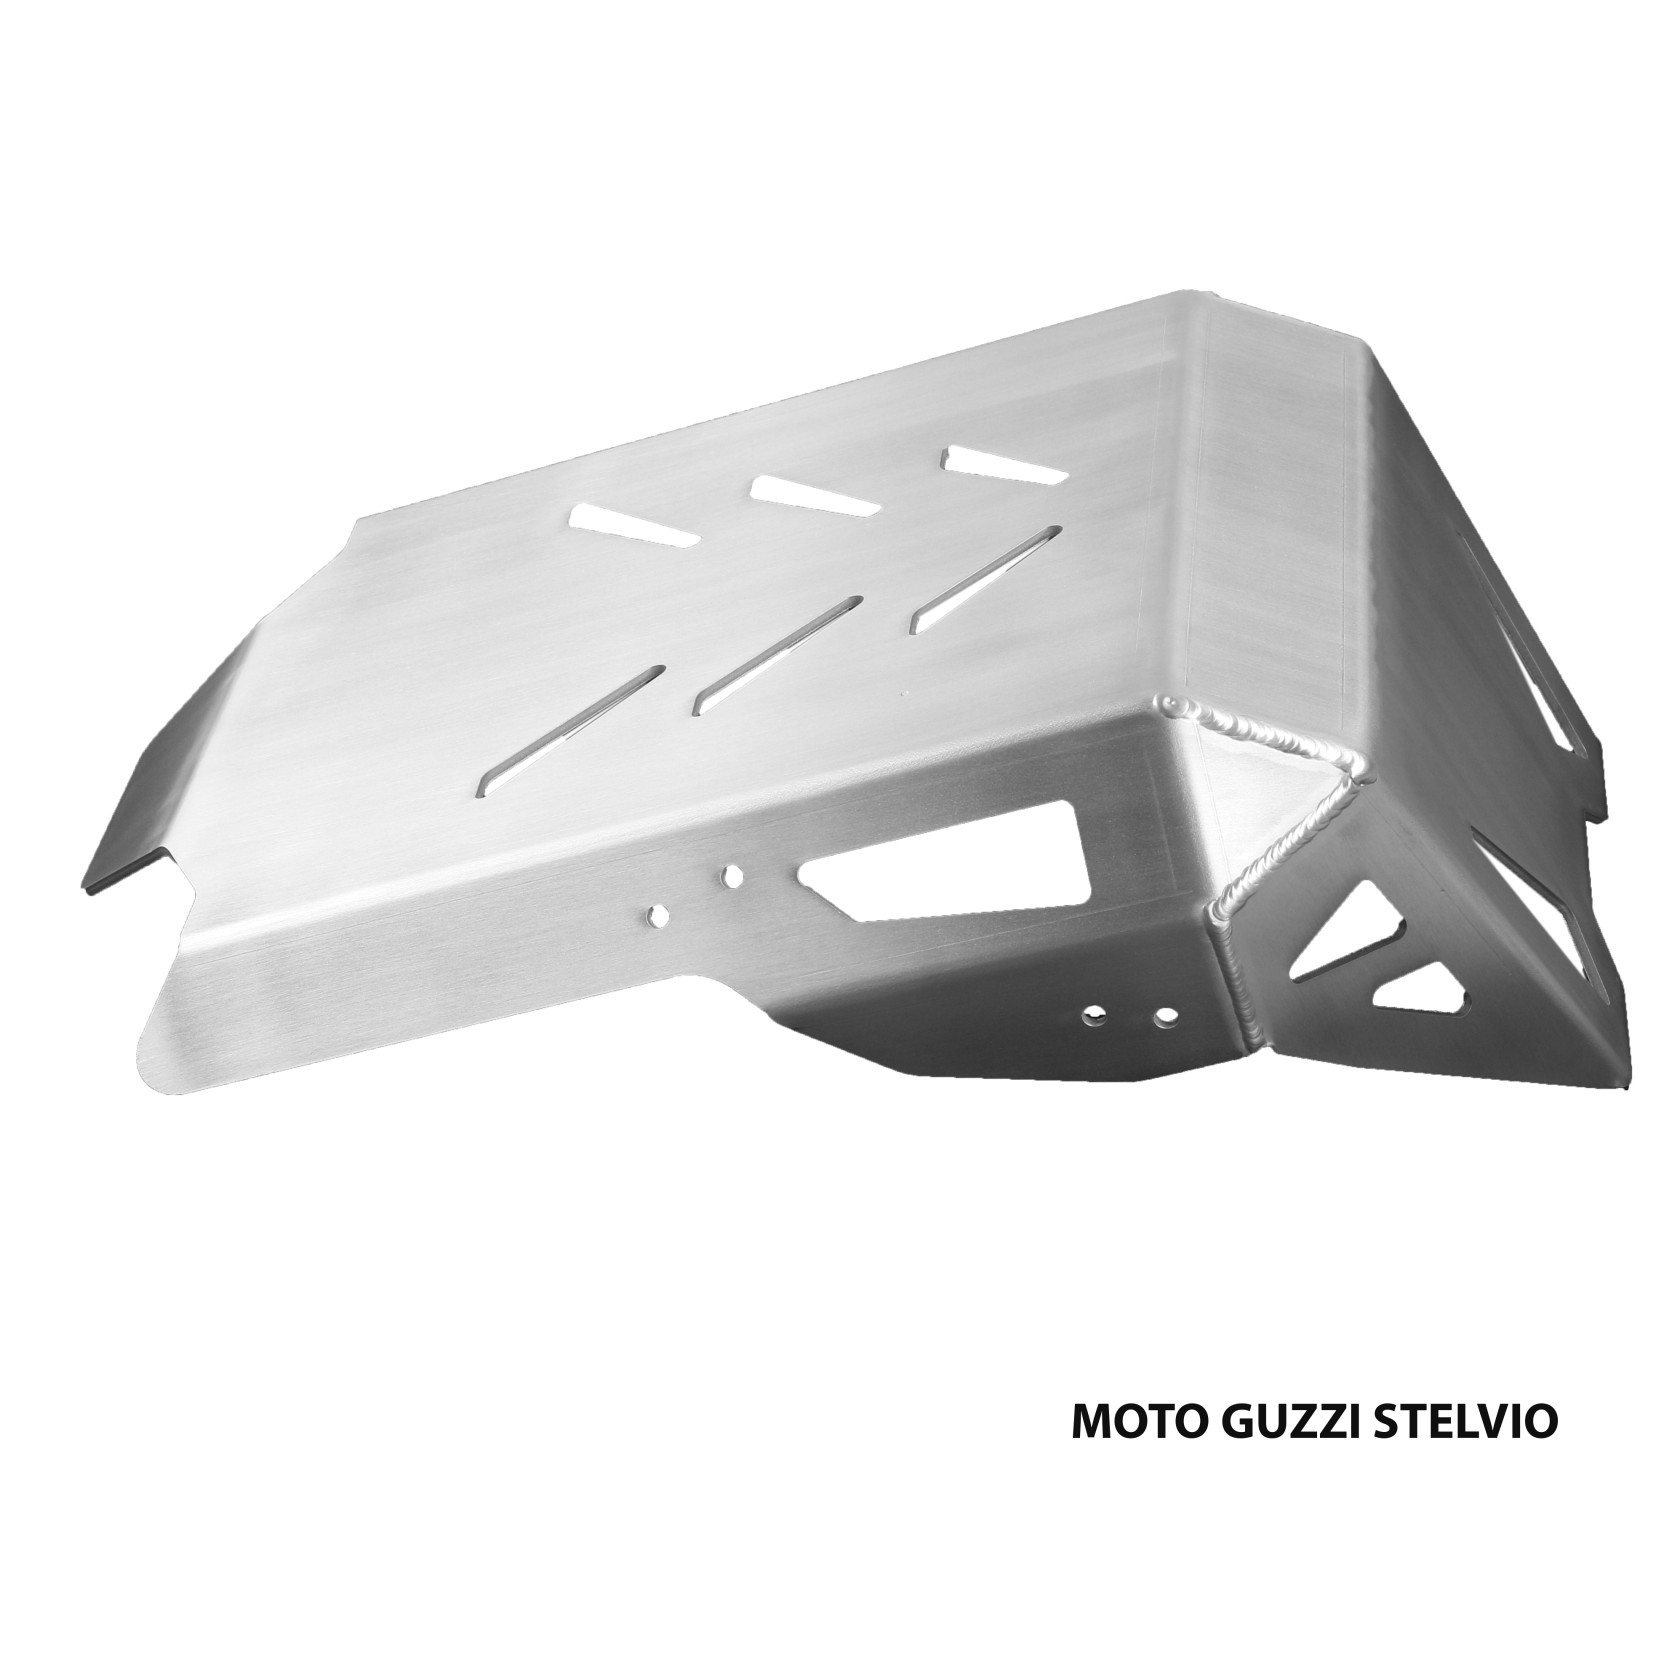 Engine protection Skid plate -Moto Guzzi Stelvio